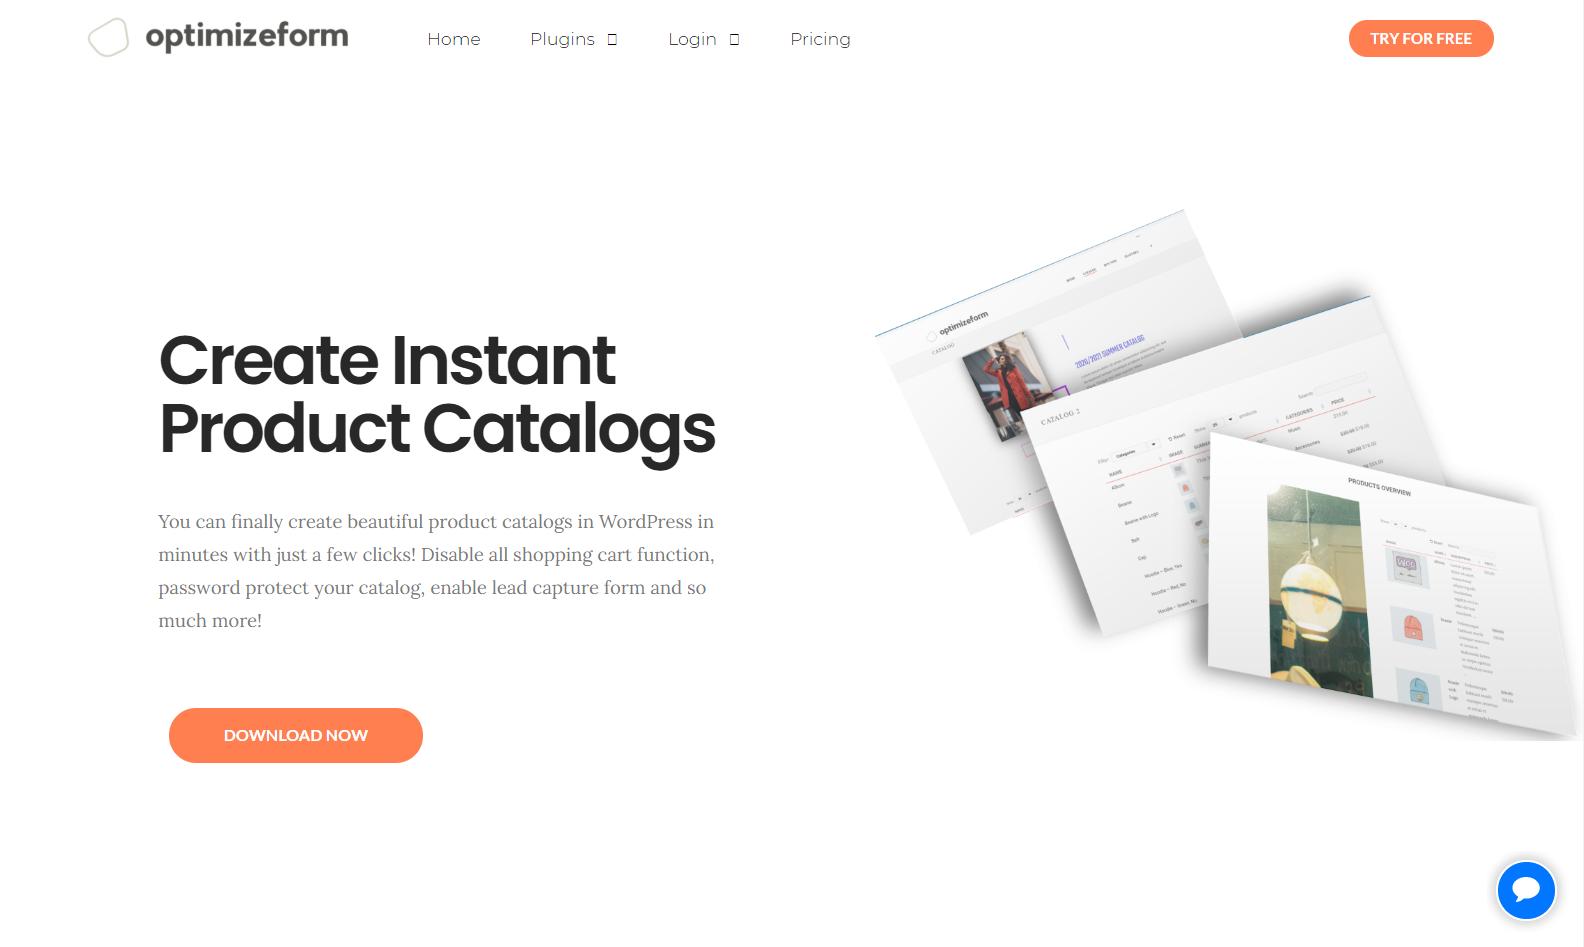 Optimizeform Catalog